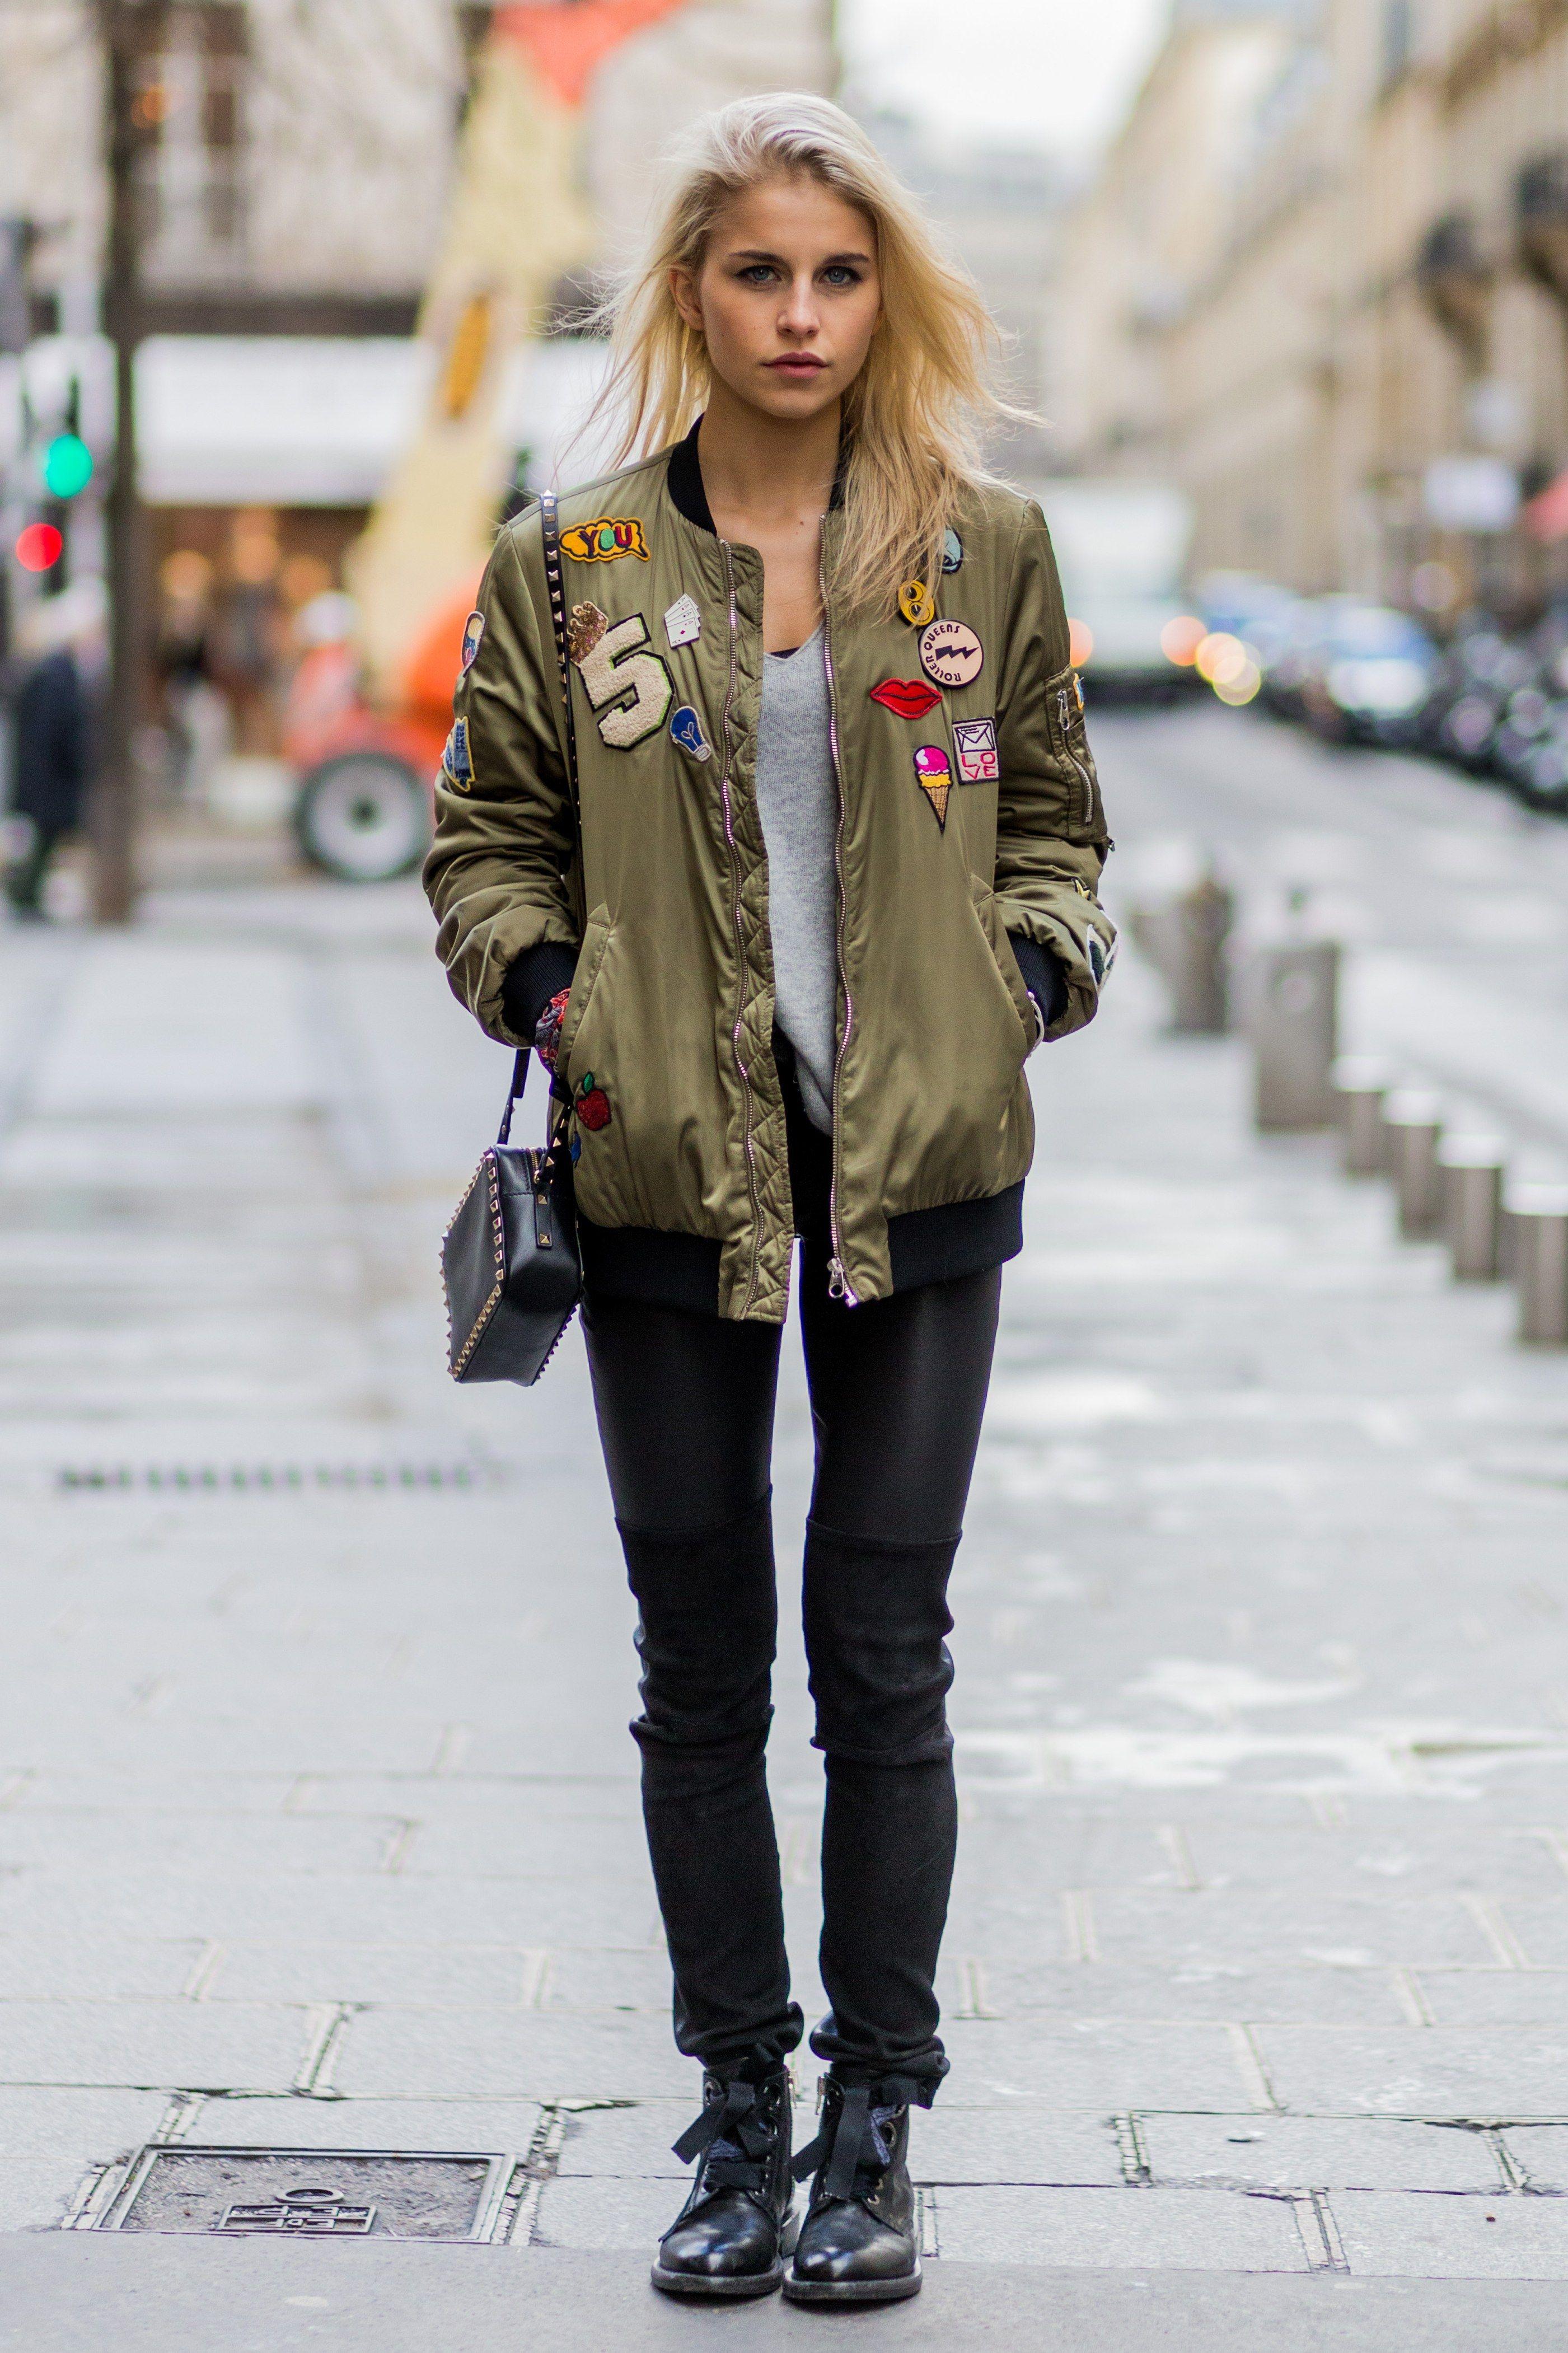 These Women S Bomber Jackets Are Celebrity Approved Bomber Jacket Street Style Bomber Jacket Women Bomber Jacket [ 4203 x 2801 Pixel ]